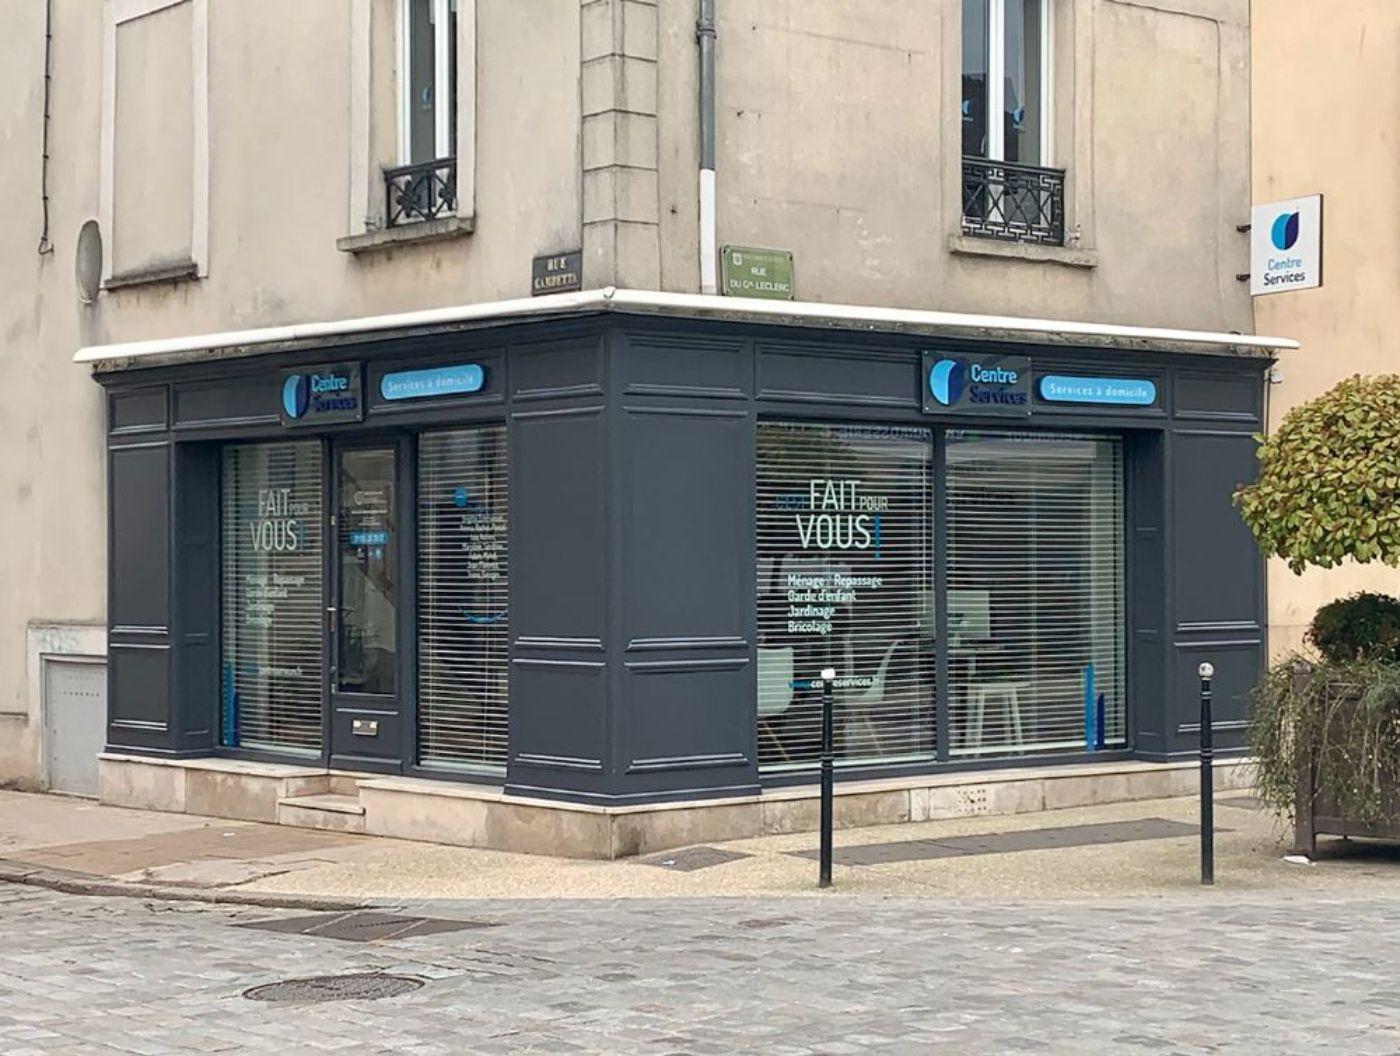 Agence de mébage à Brie-Comte-Robert